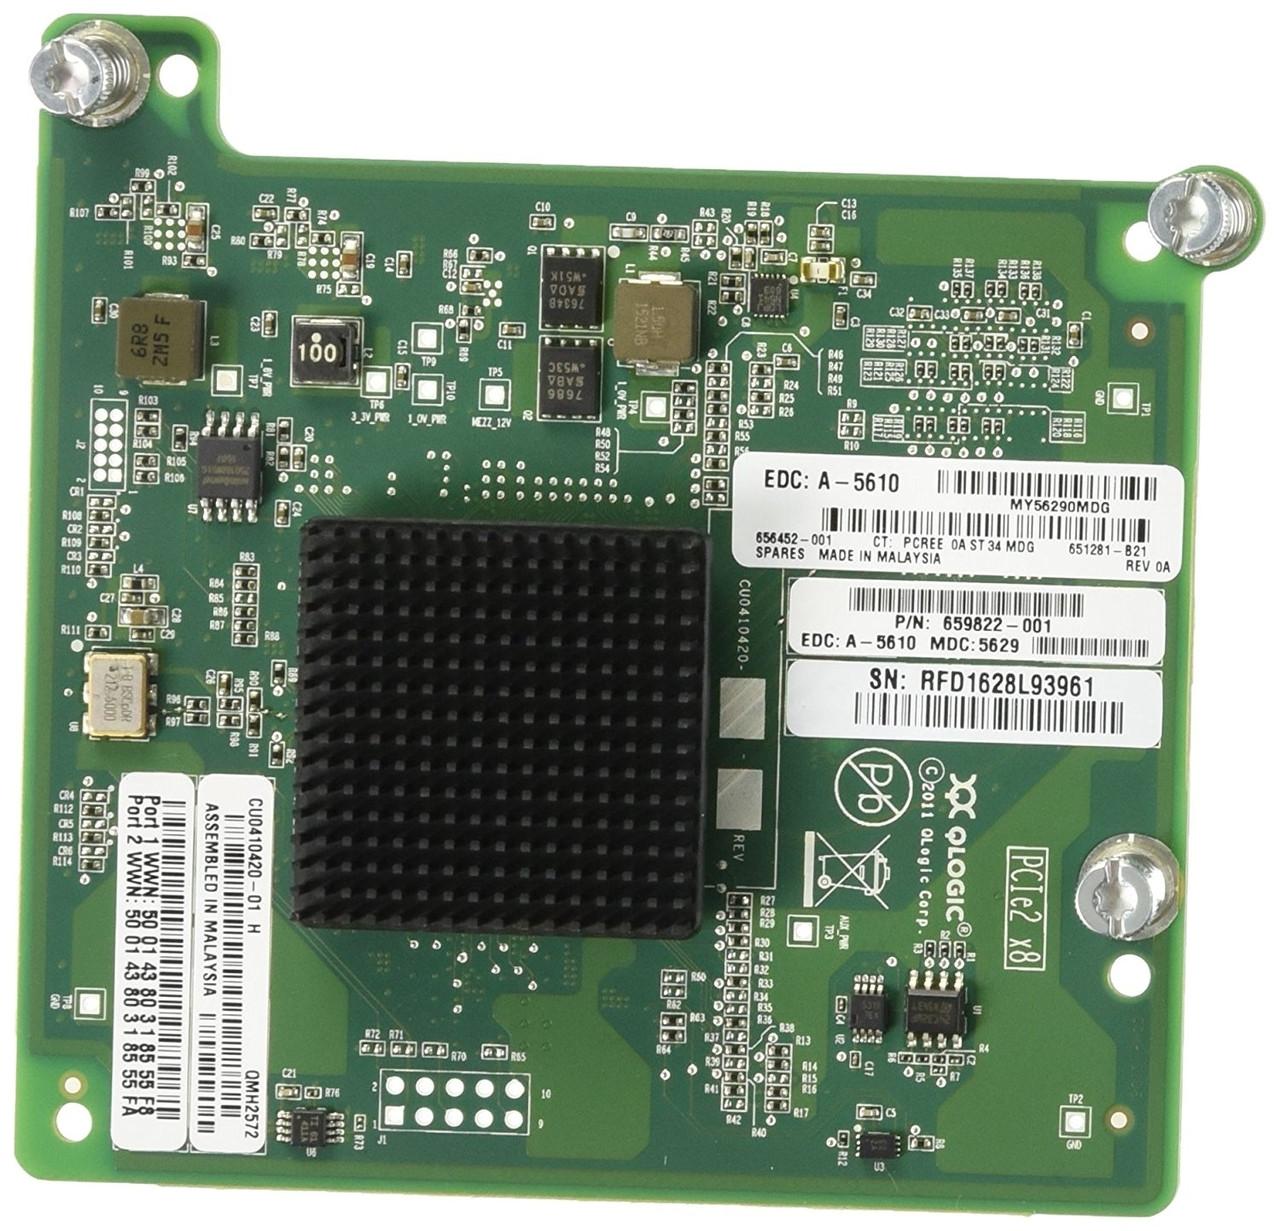 QMH2572-HP HPE 8GB FC MEZZANINE ADAPTER FIBRE CHANNEL HOST BUS ADAPTER